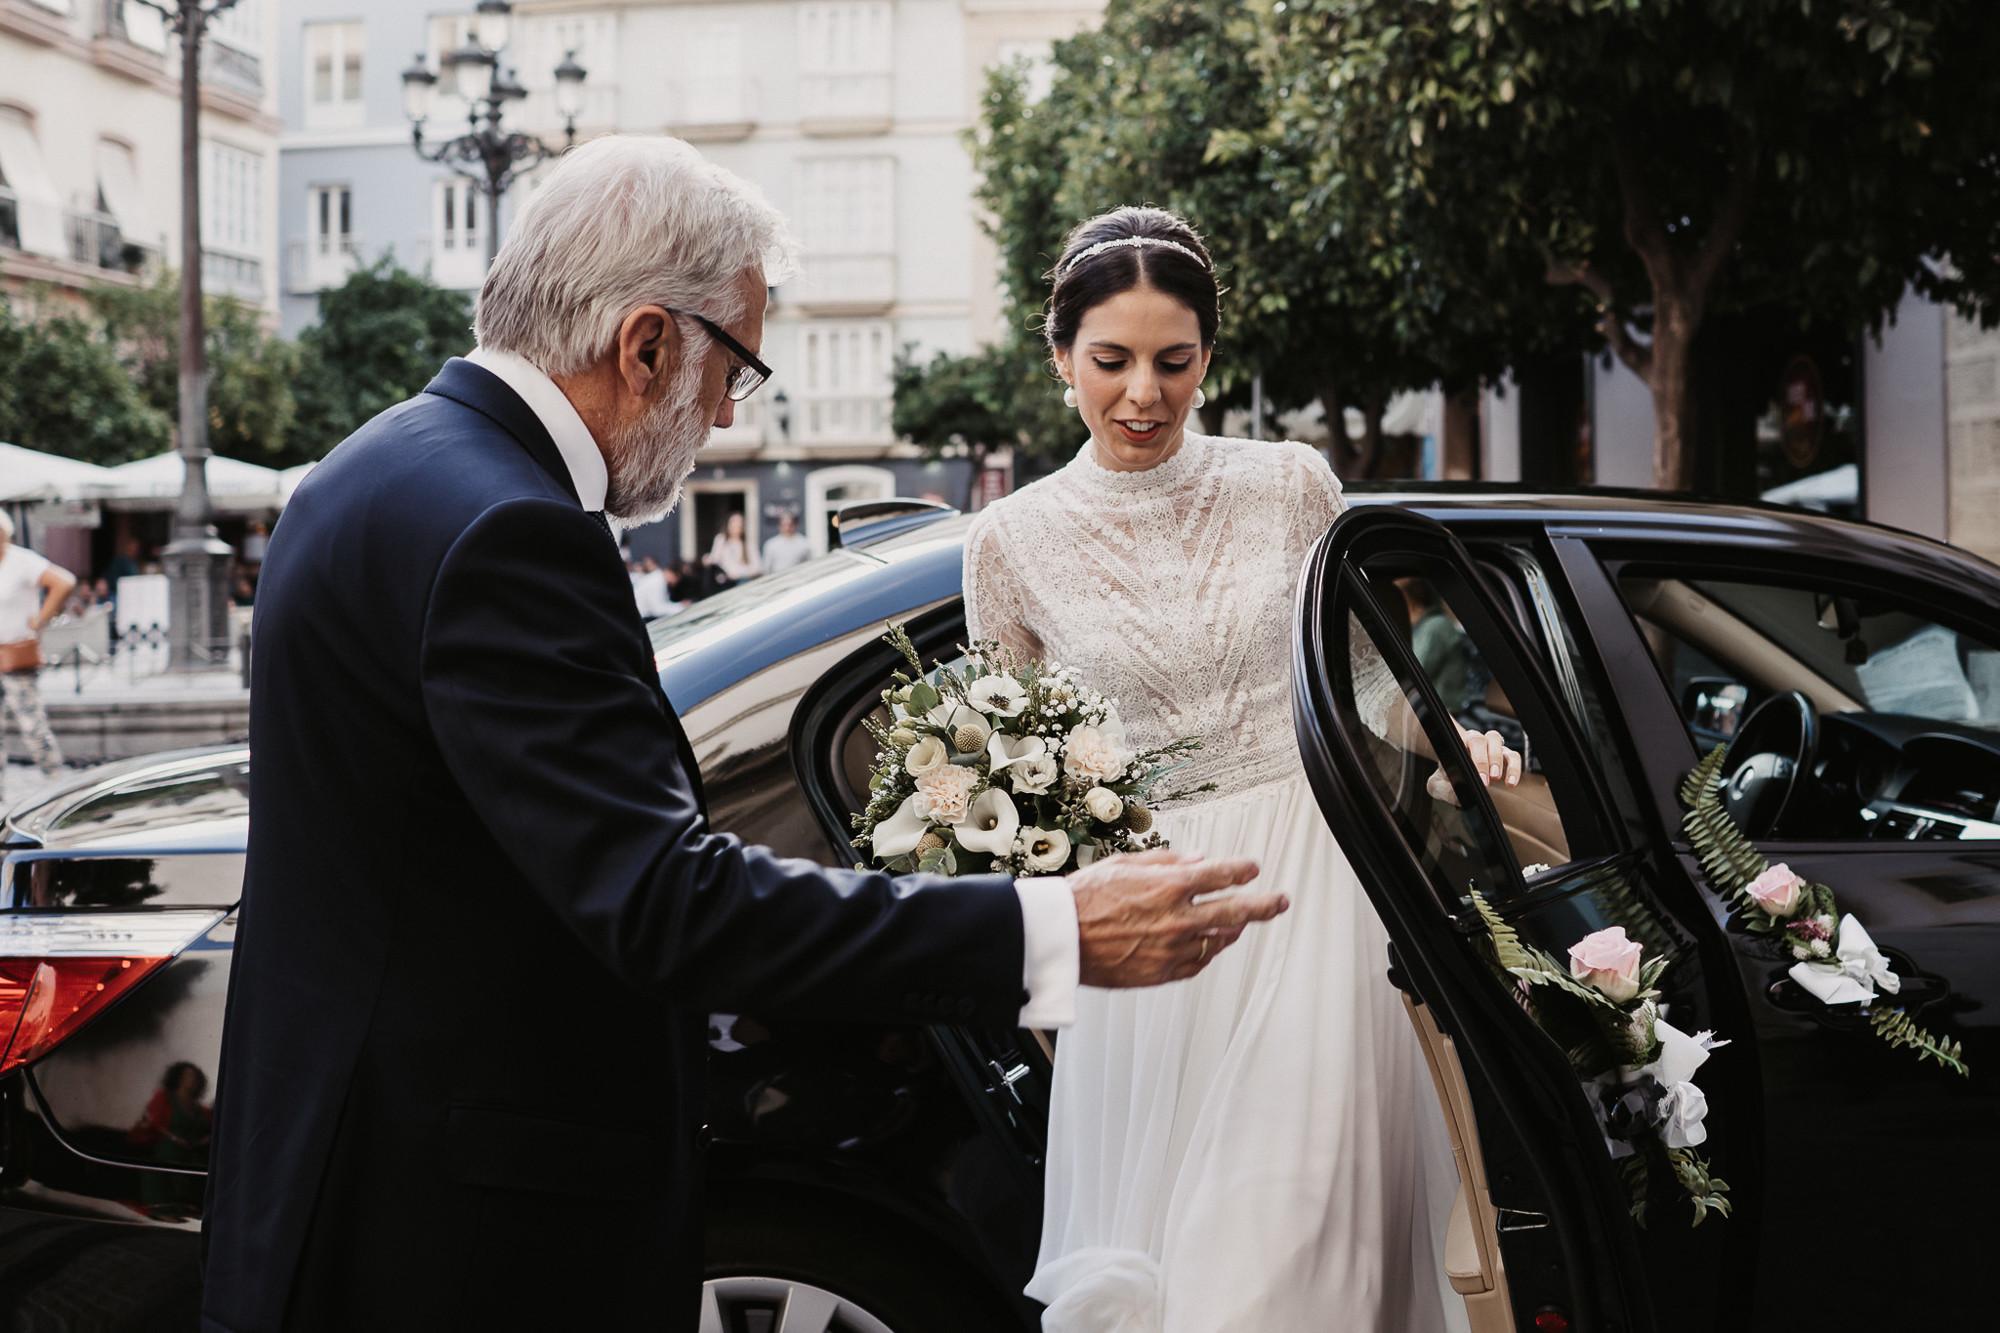 fotógrafo-boda-cádiz-el-creador-de-recuerdos-3